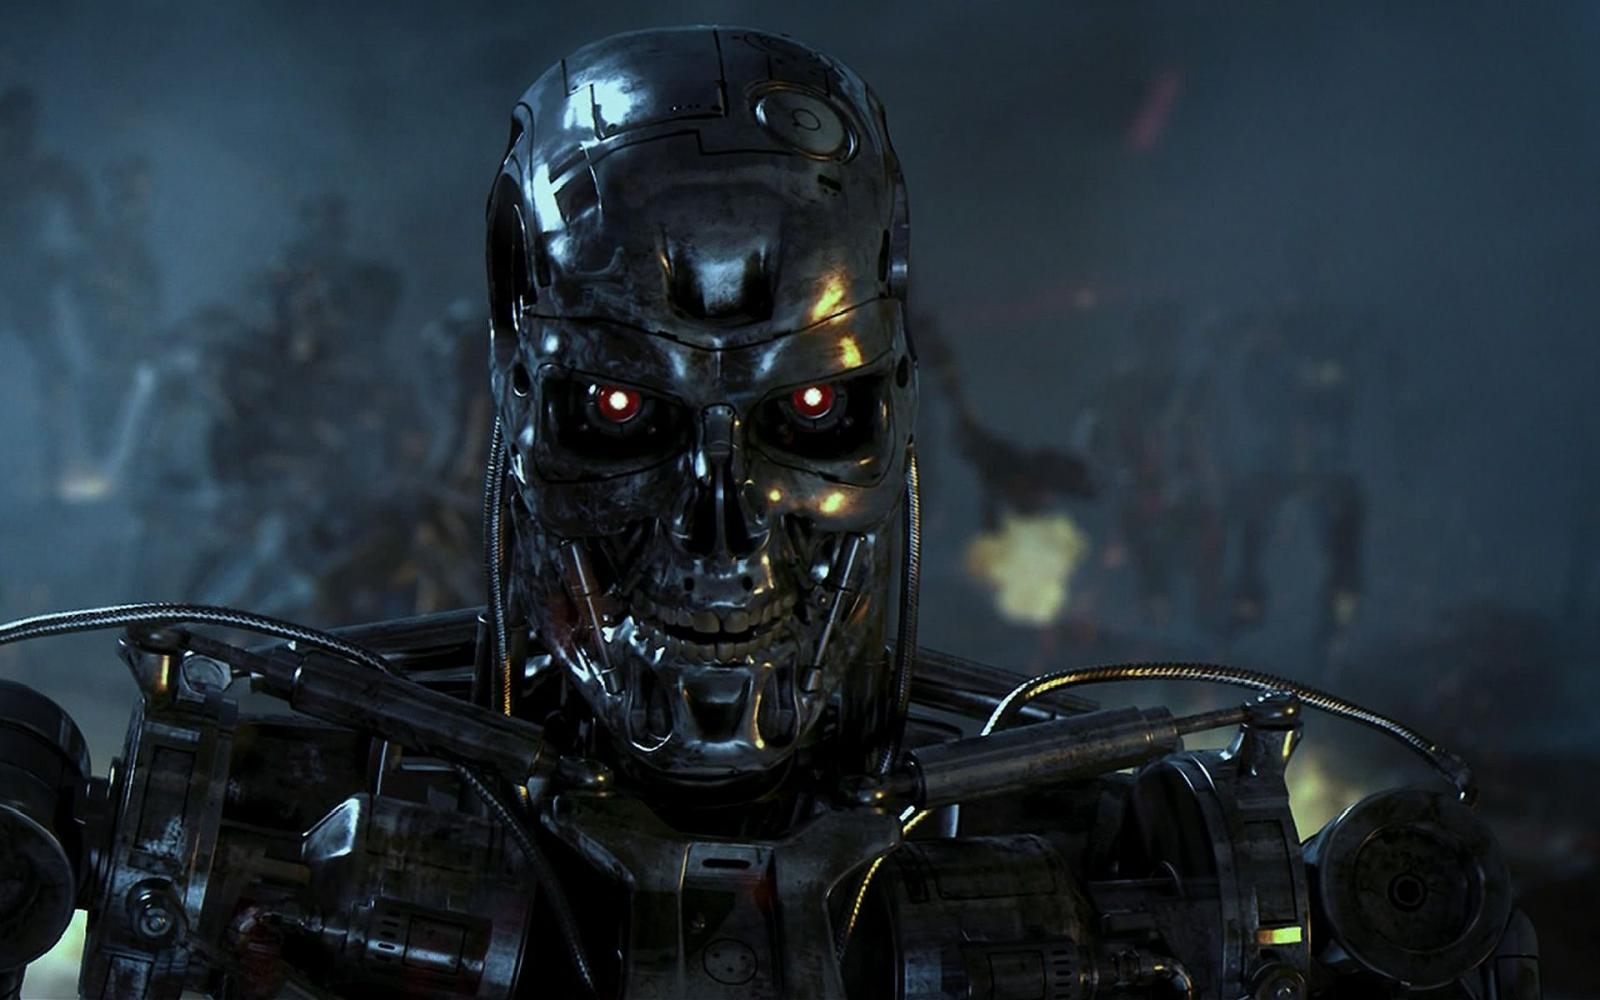 United Nations Robot War